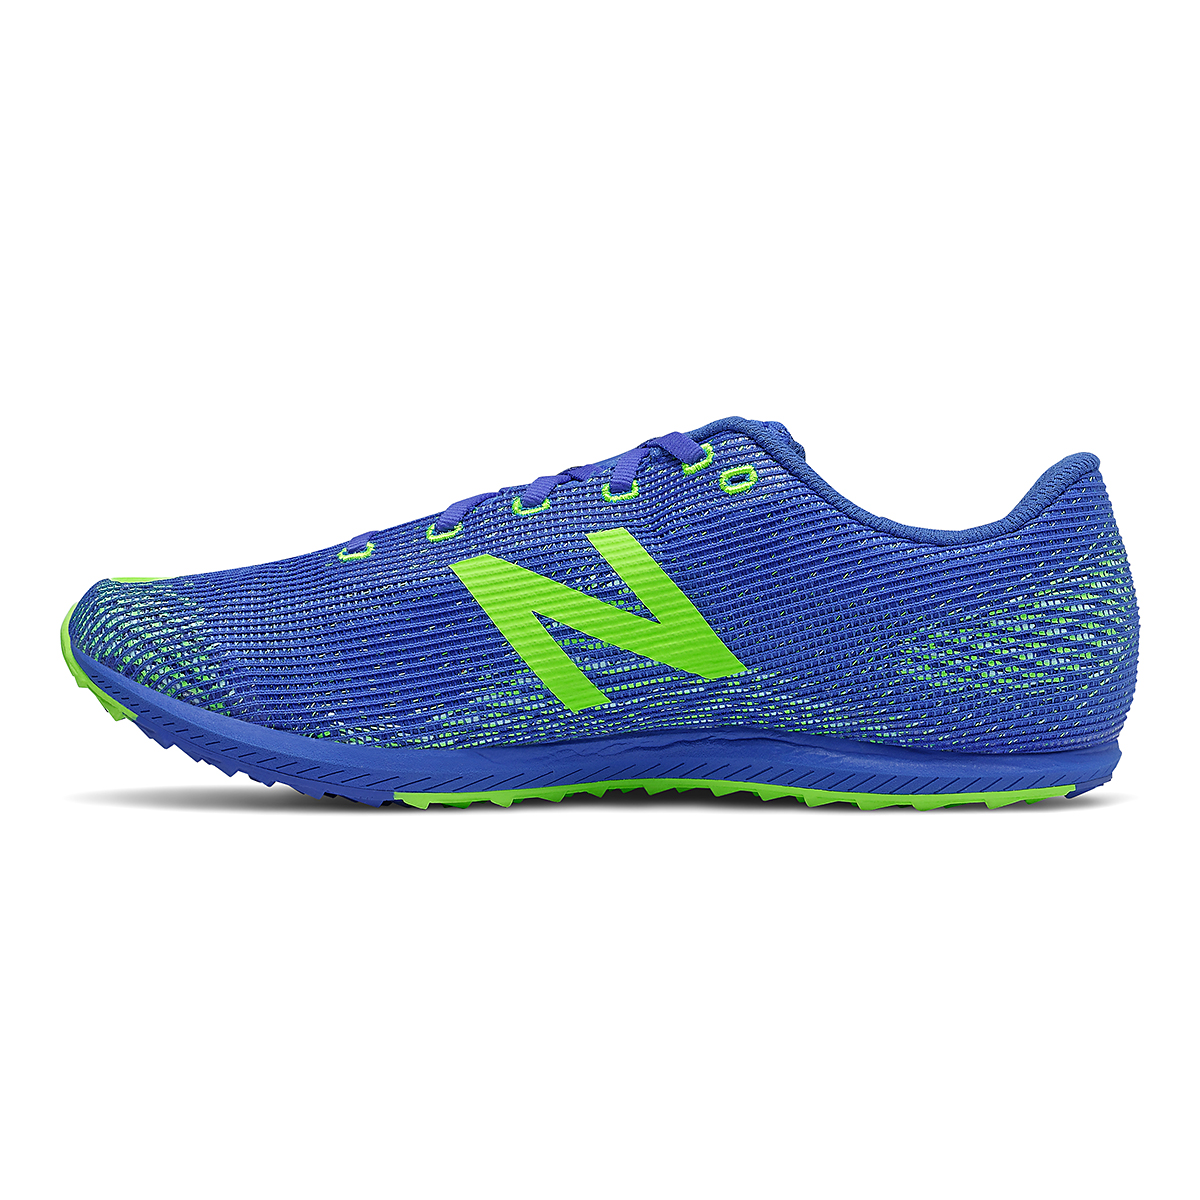 Men's New Balance XC Seven v3 Spikeless Shoe - Color: Cobalt/Energy Lime - Size: 7 - Width: Regular, Cobalt/Energy Lime, large, image 2